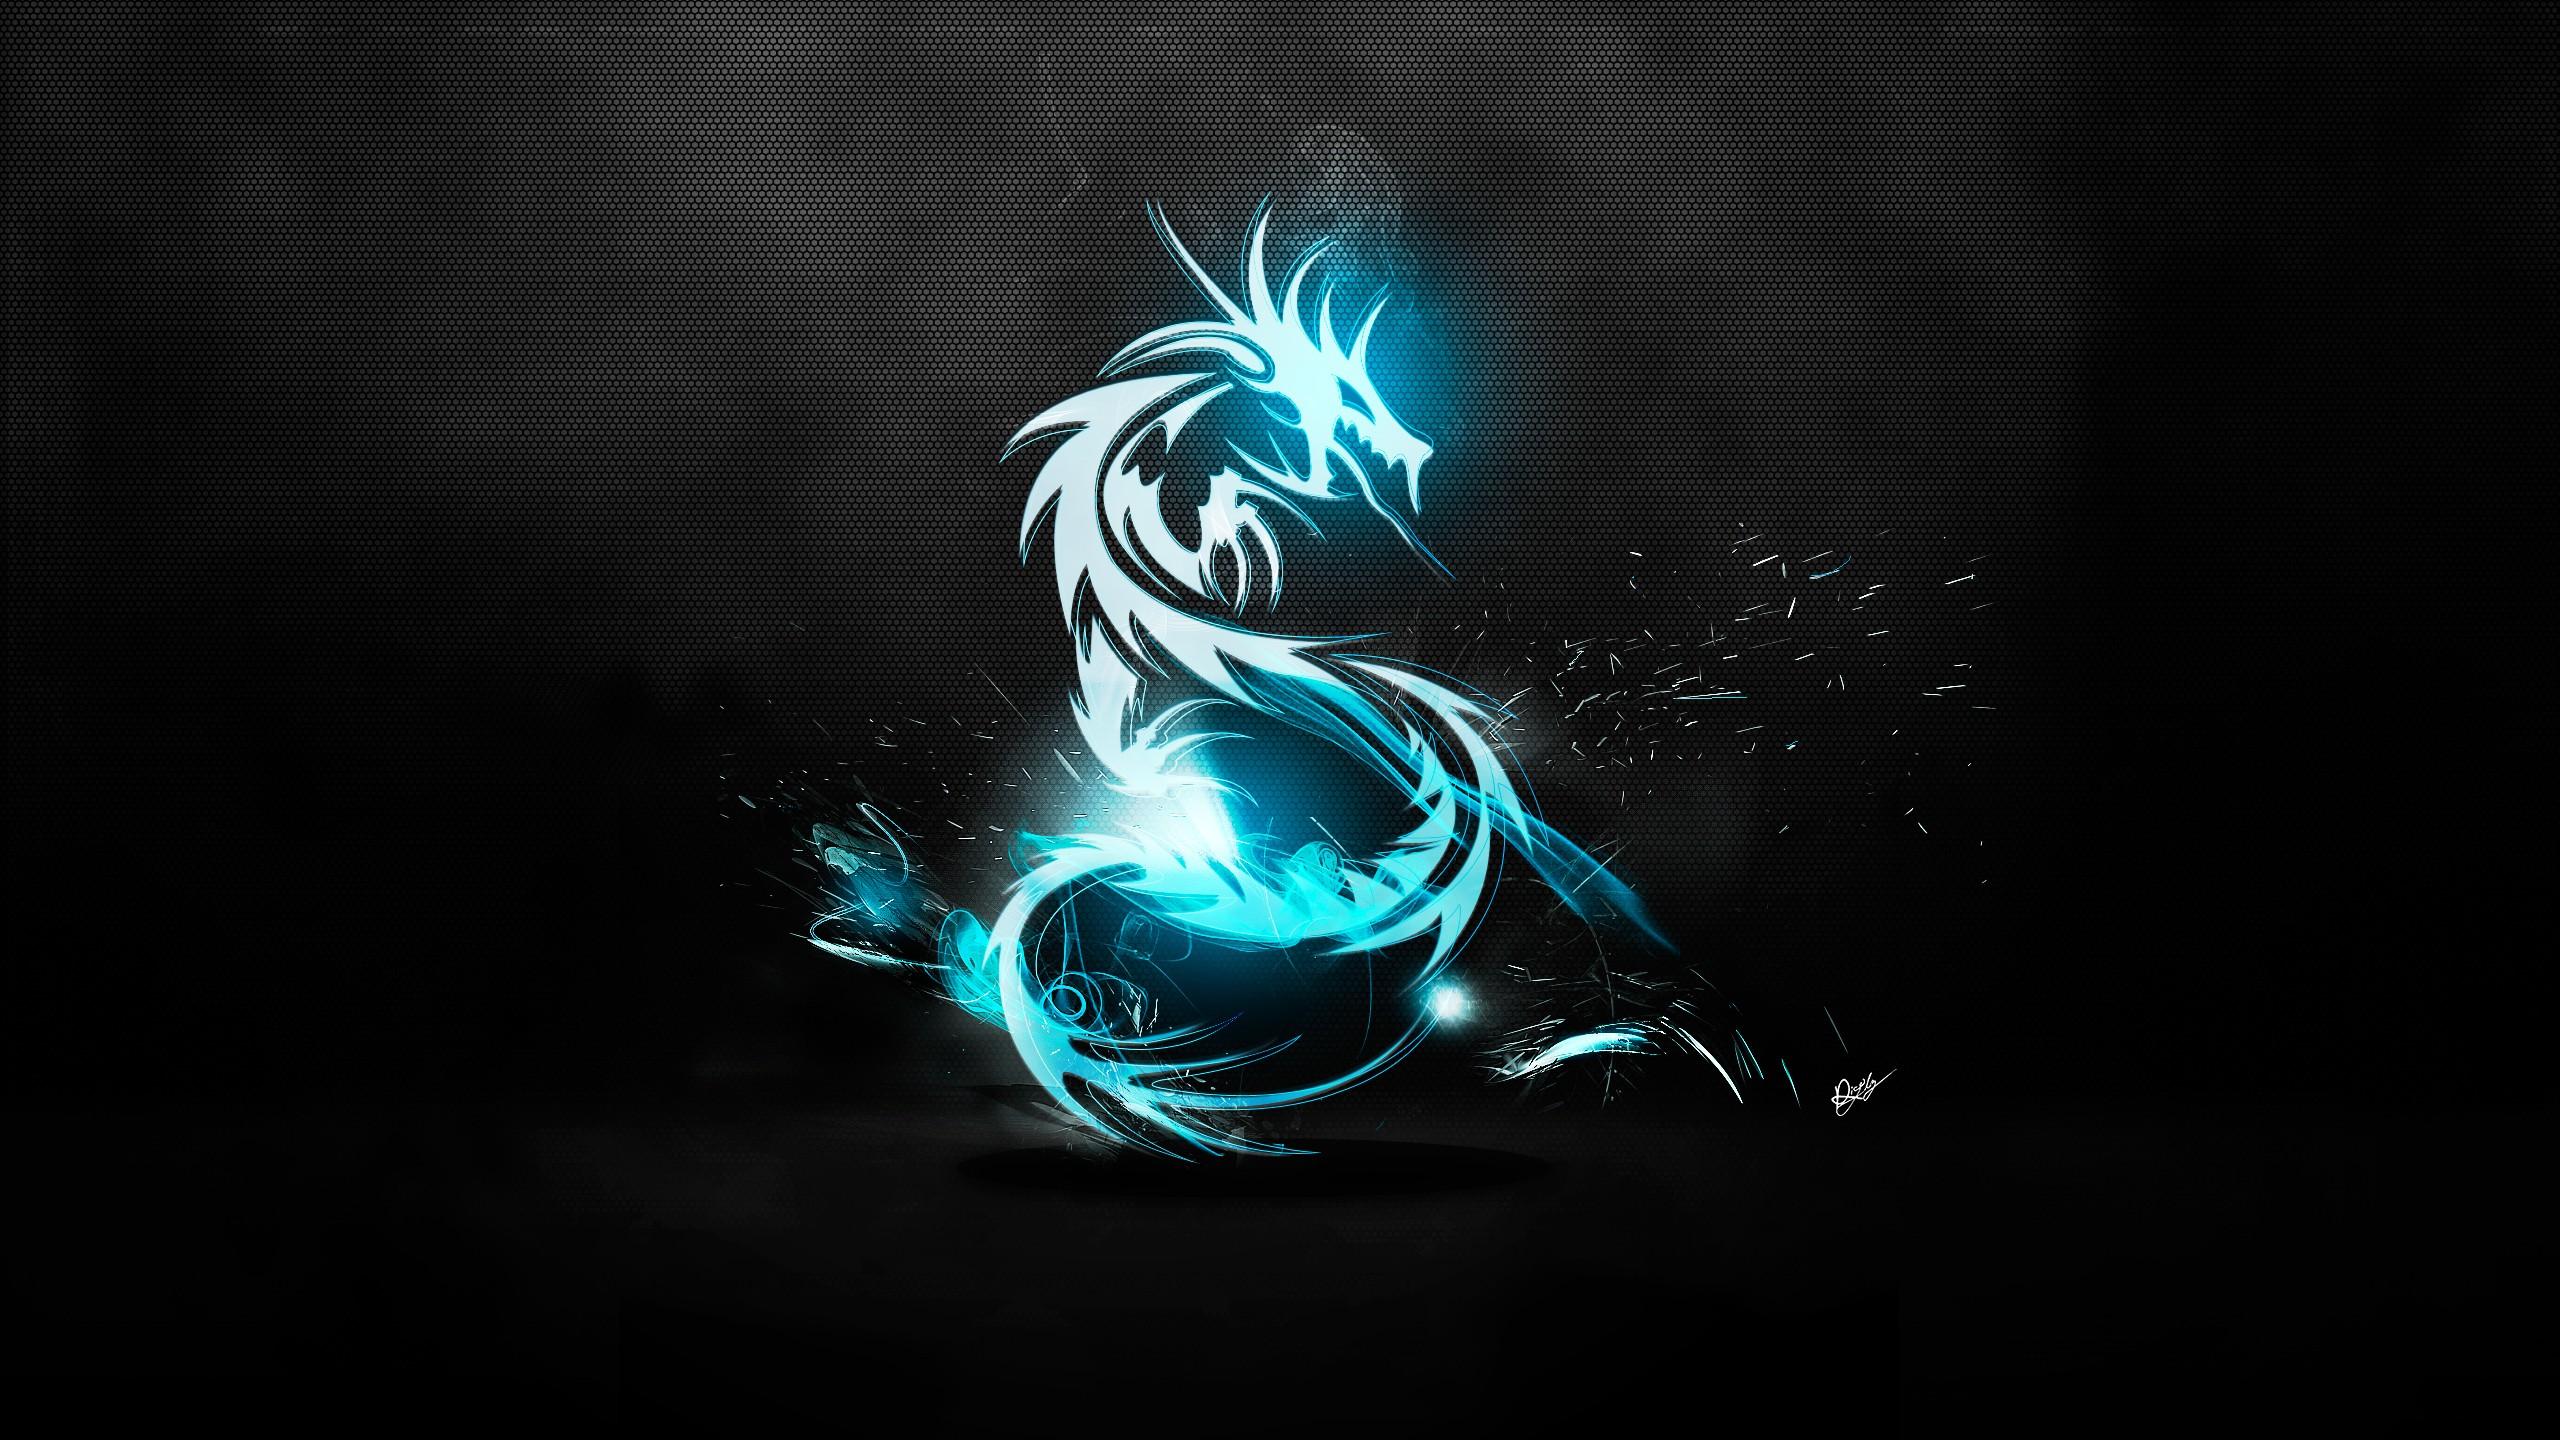 Blue Dragon logo AMD hd wallpaper background HD Wallpapers 2560x1440